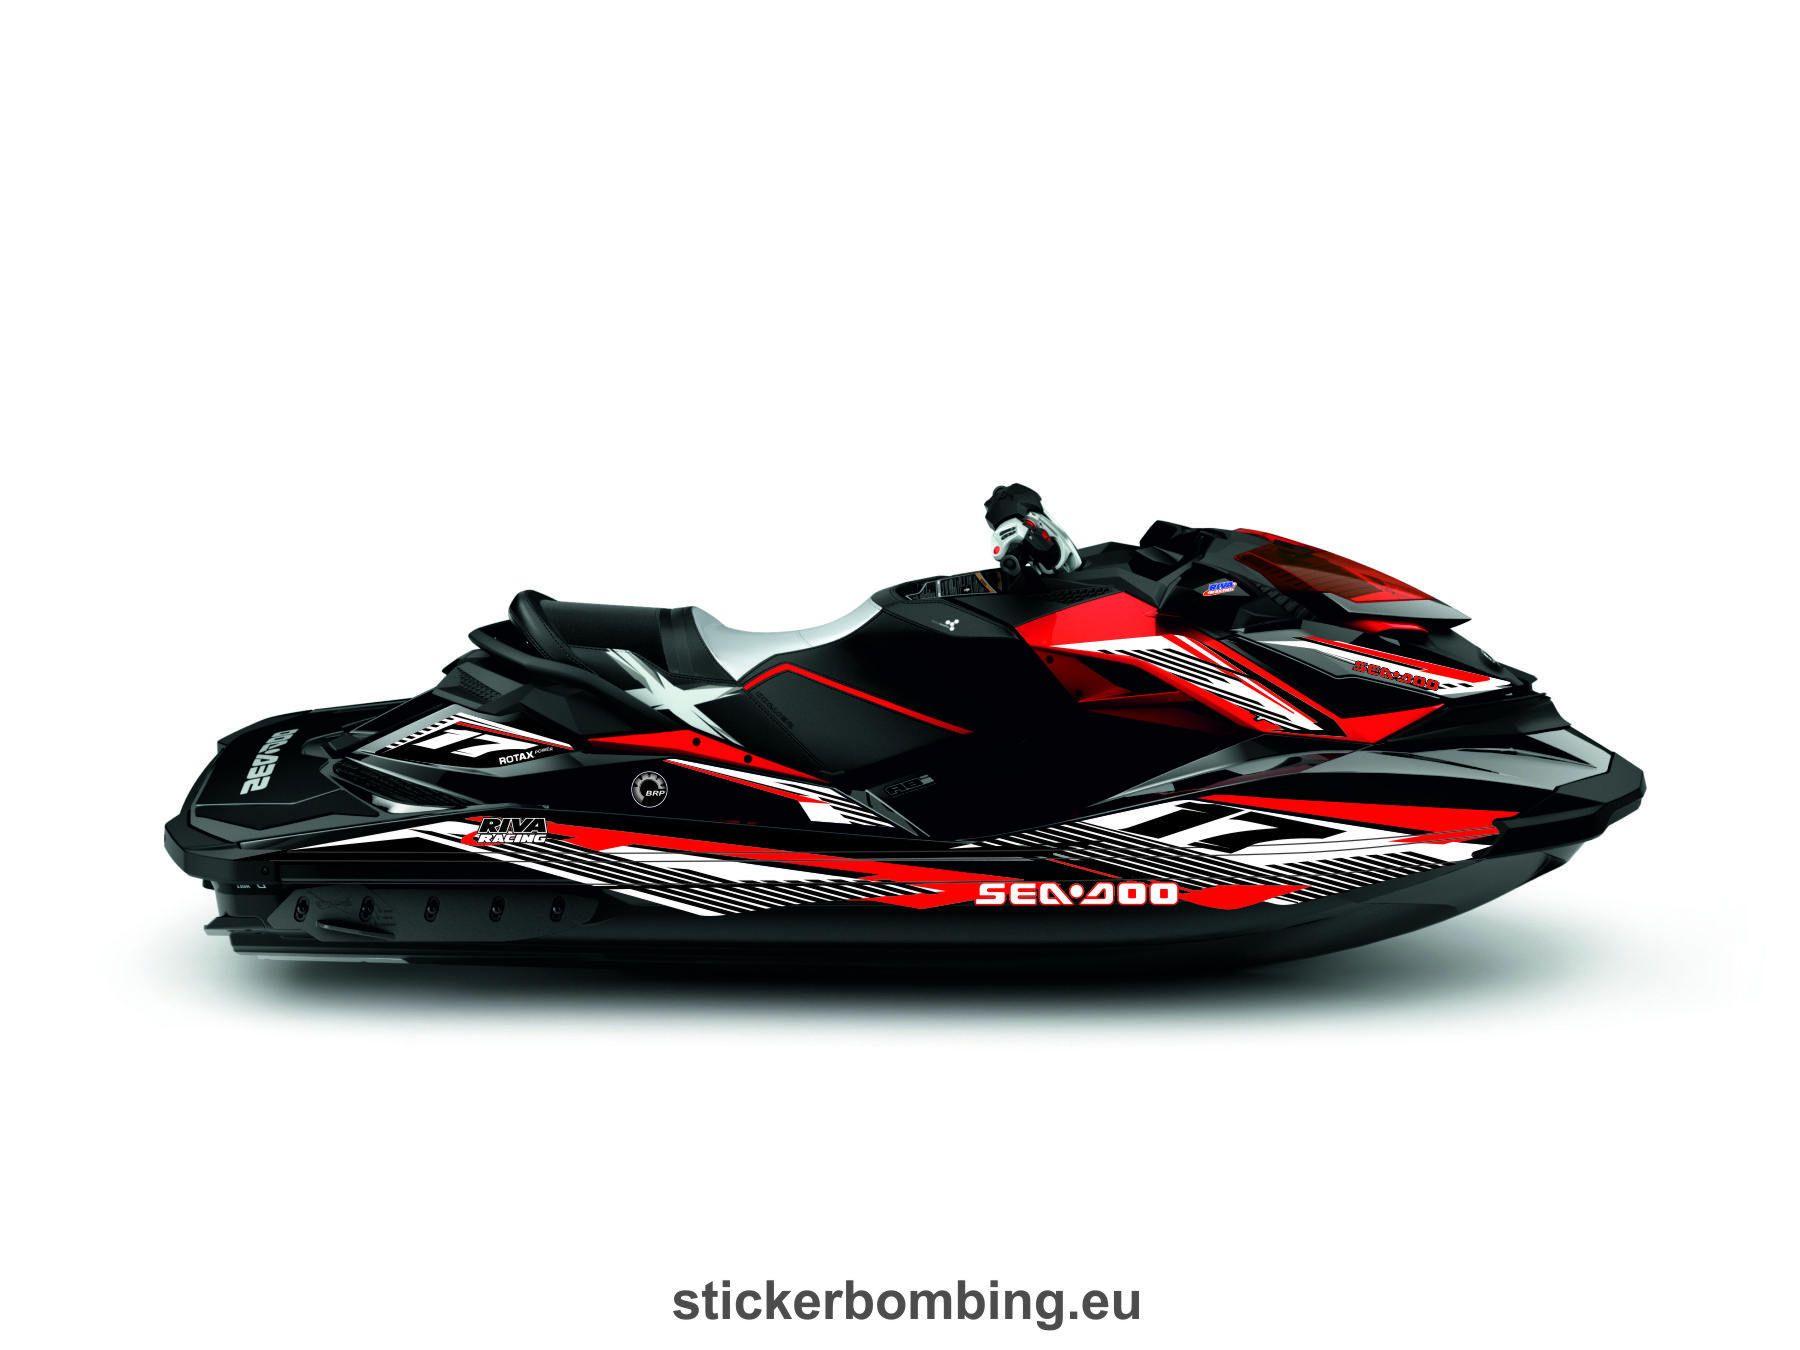 Sea Doo Rxp X 260 Rs Jet Ski Full Set Stickers Jet Ski Seadoo Jetski Seadoo